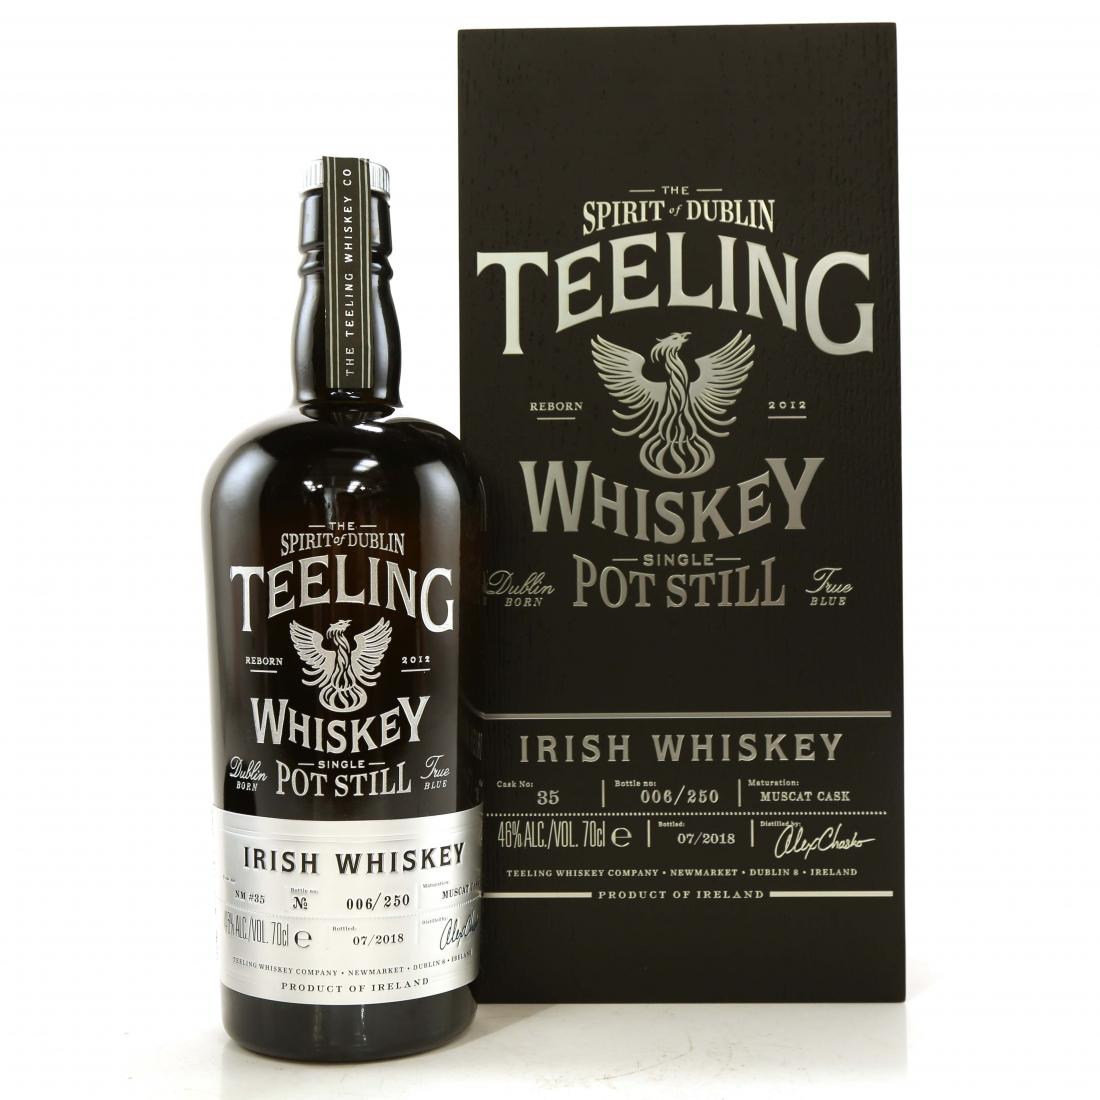 Teeling Celebratory Single Pot Still Whiskey / Bottle #006